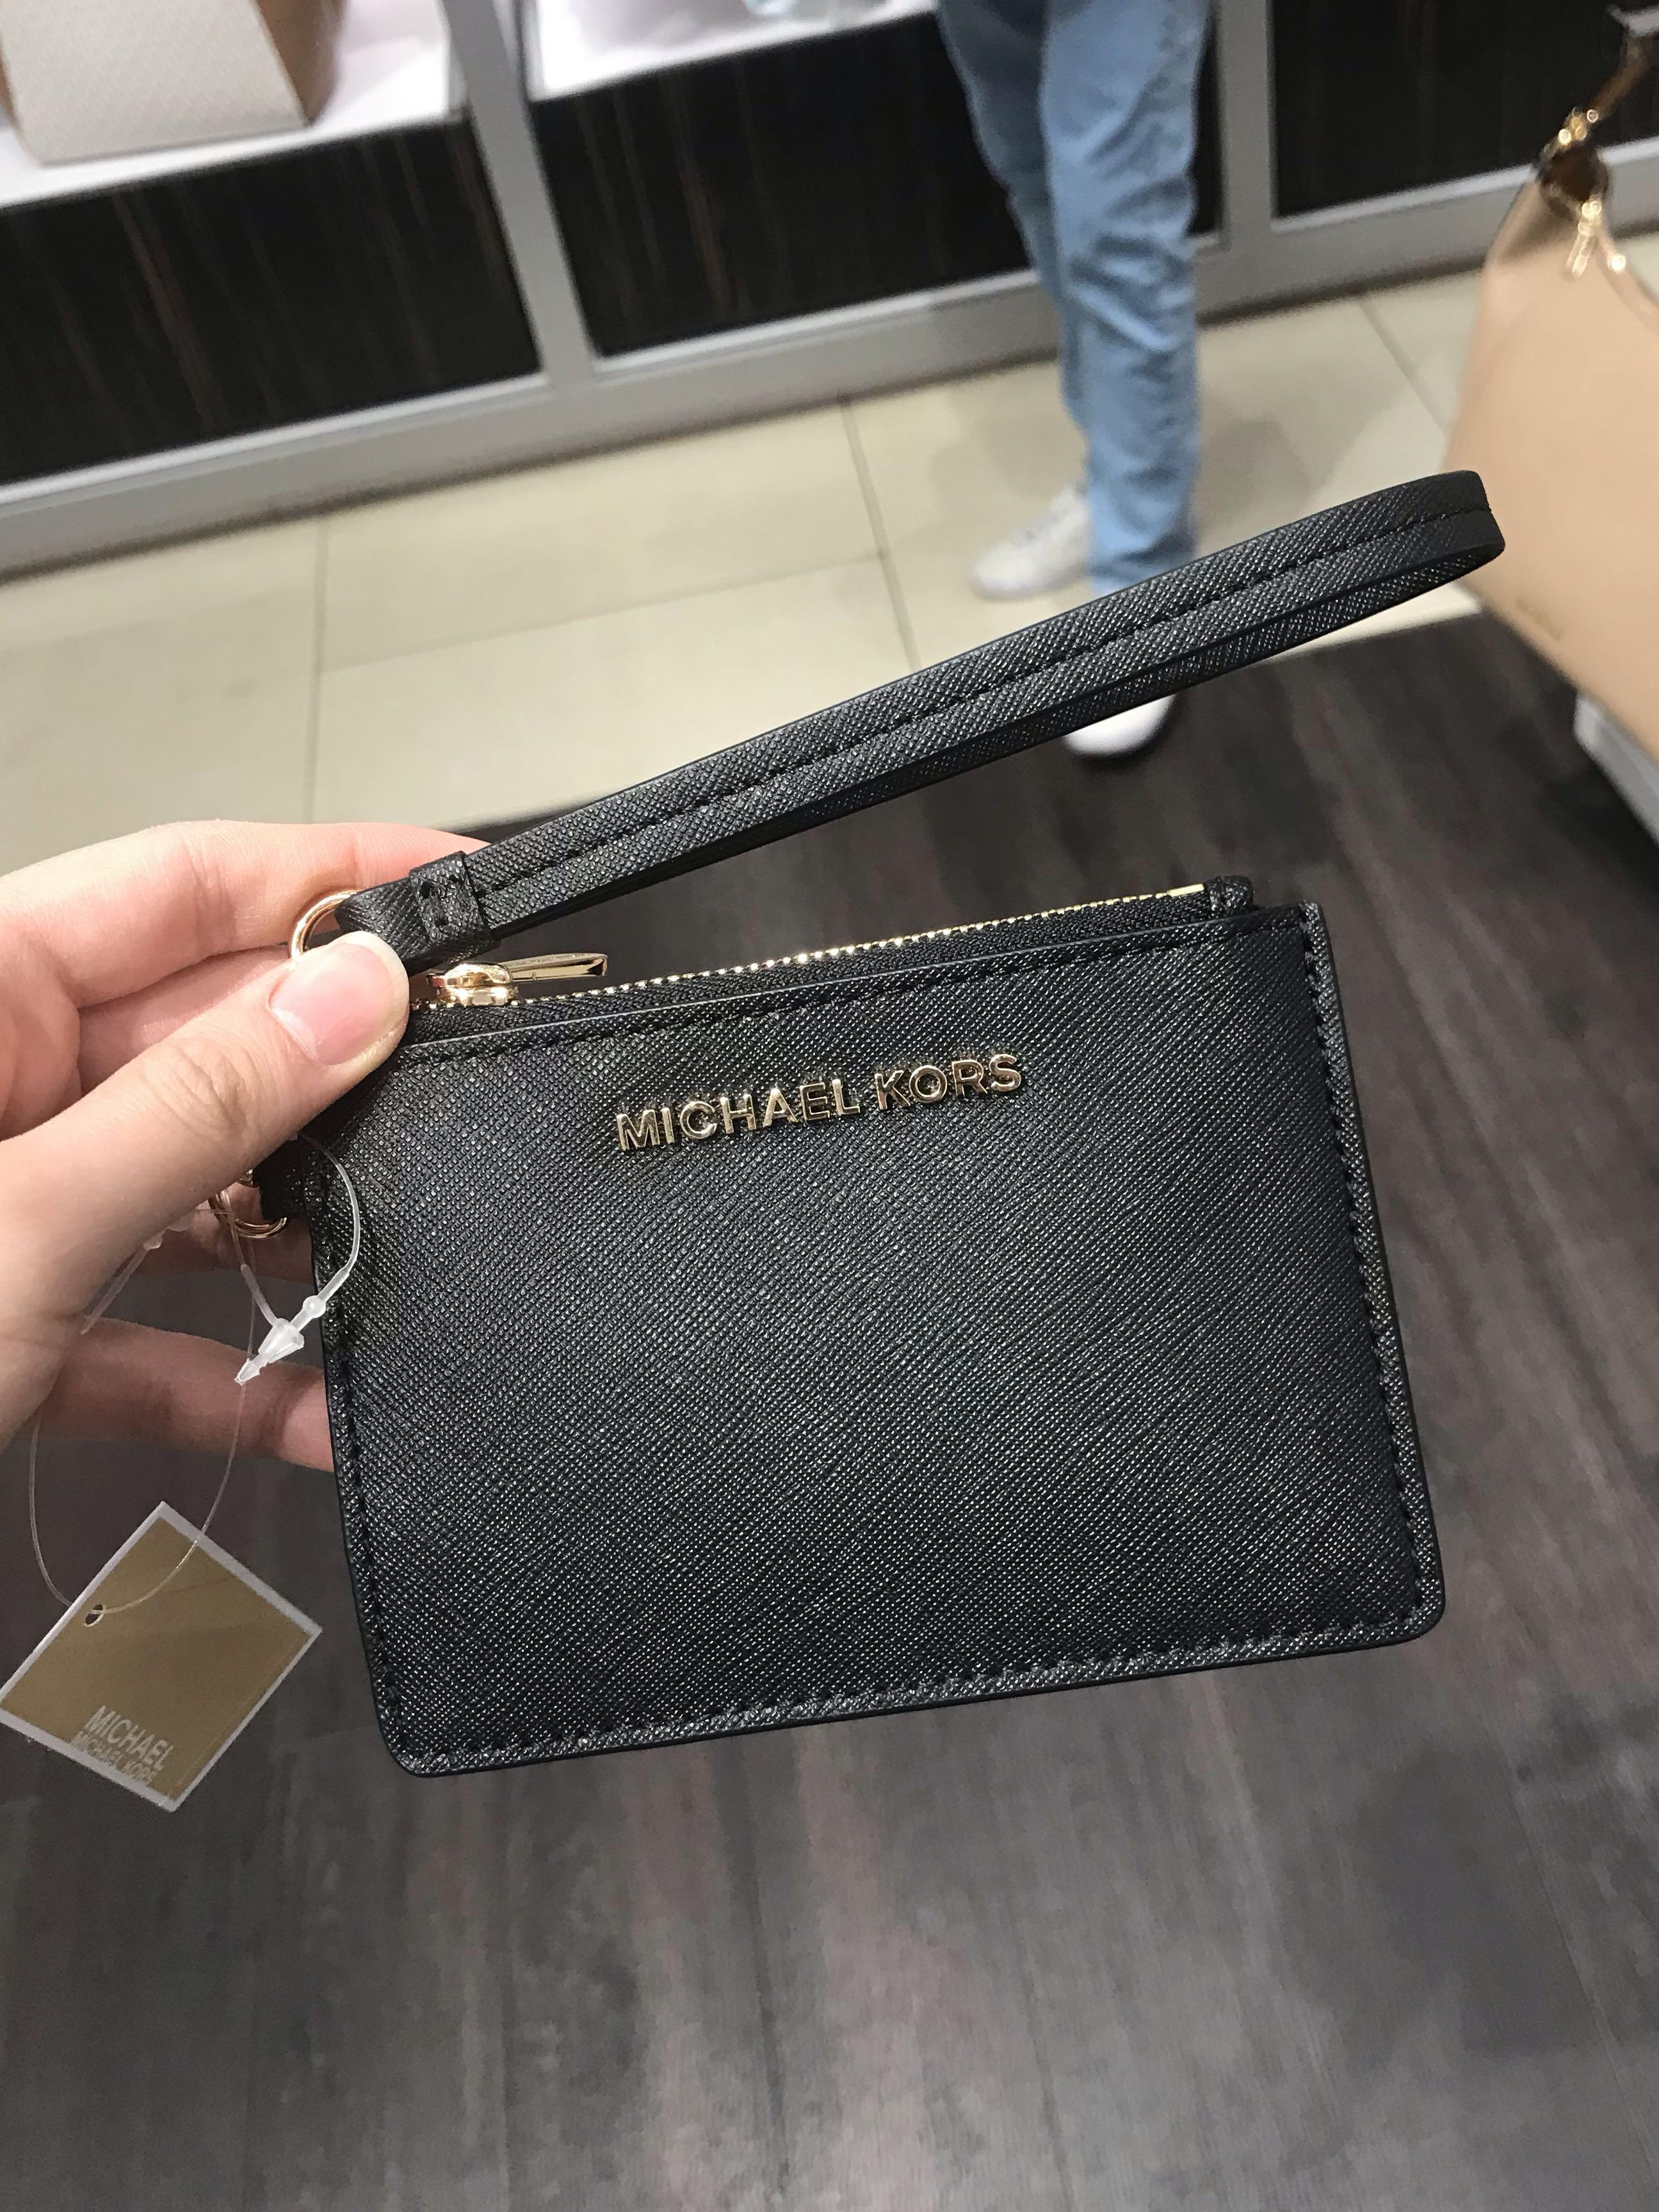 a989bbdf2956 Michael Kors Jet Set Travel coin purse Wristlet black, Women's ...